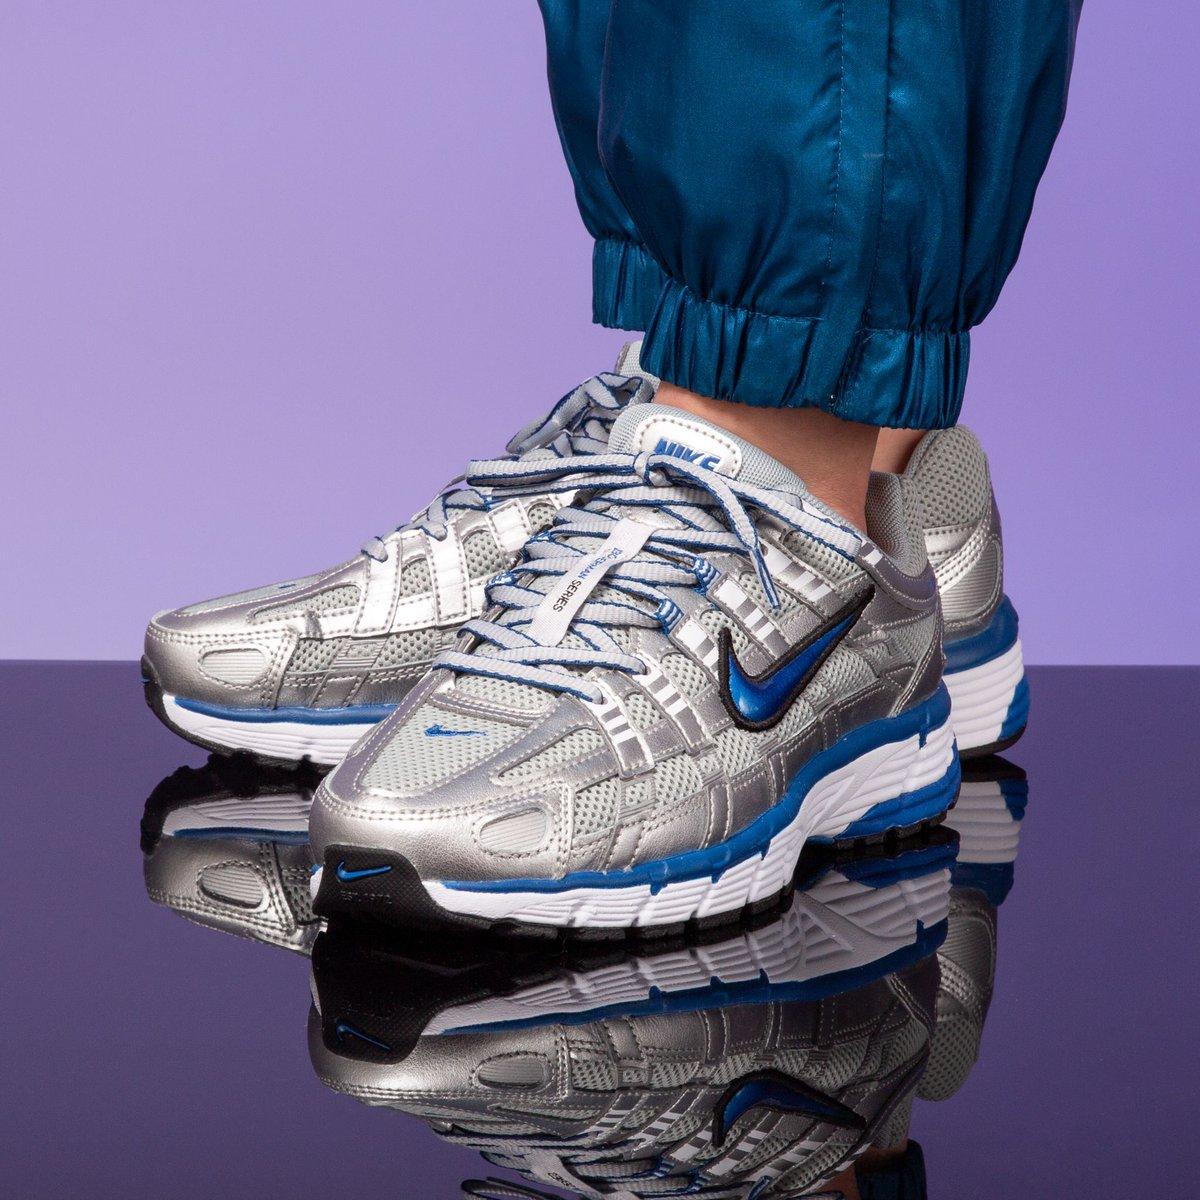 newest 945f3 c06f7 Nike Wmns P-6000 -Metallic Silver Team Royal-White-Black SHOP HERE   https   t.co lo0QFHzxCT…